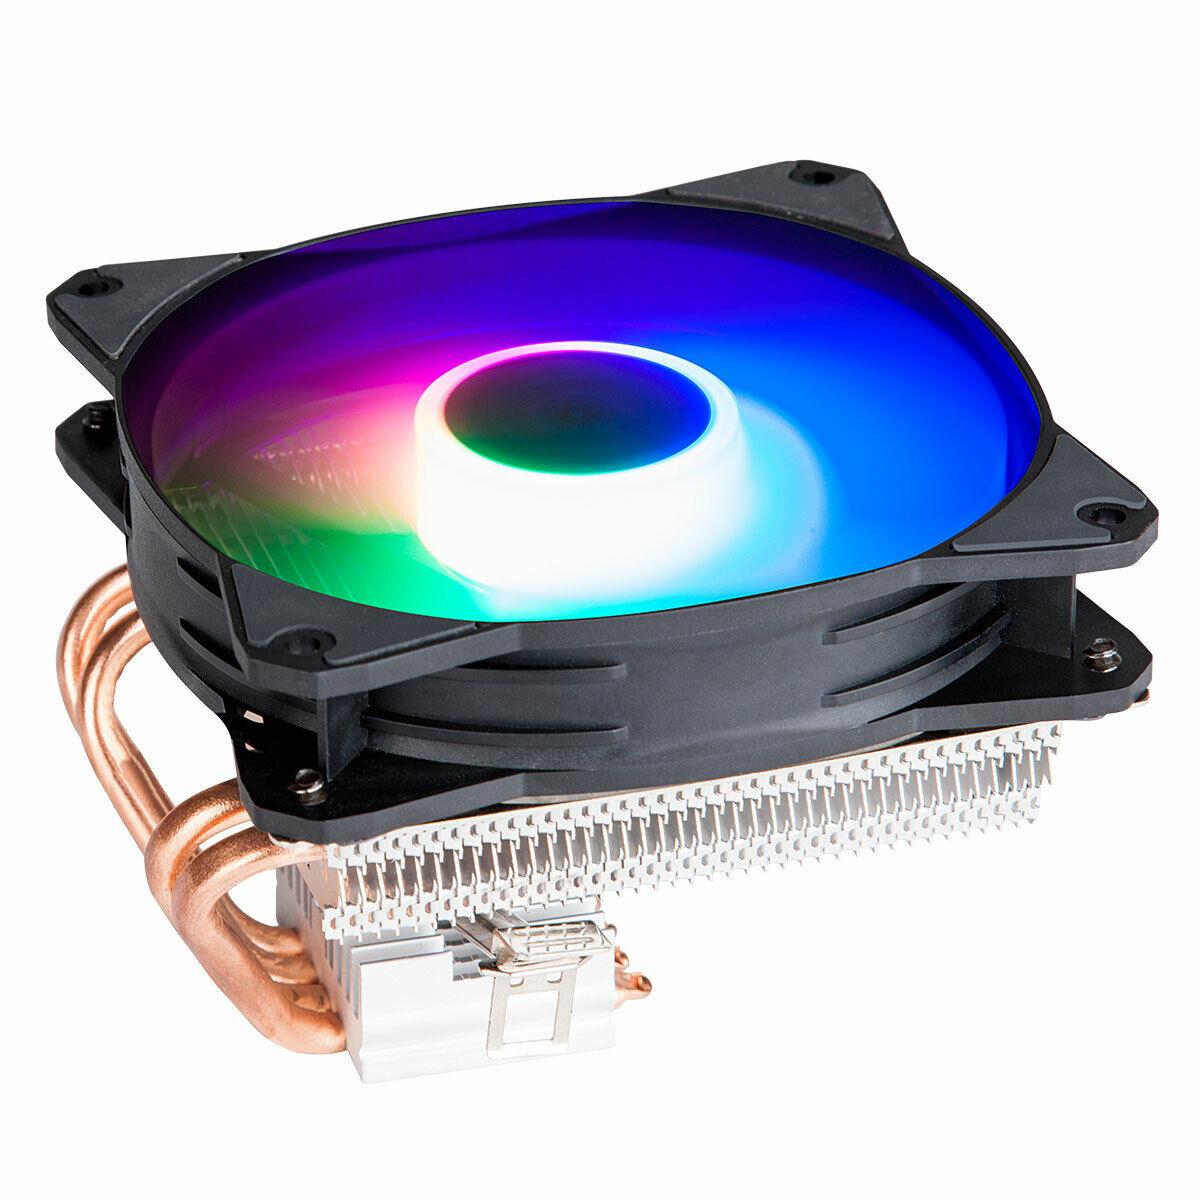 GOLDEN FIELD Z100 CPU Cooler 4 Heatpipes Heatsink LED Coolin